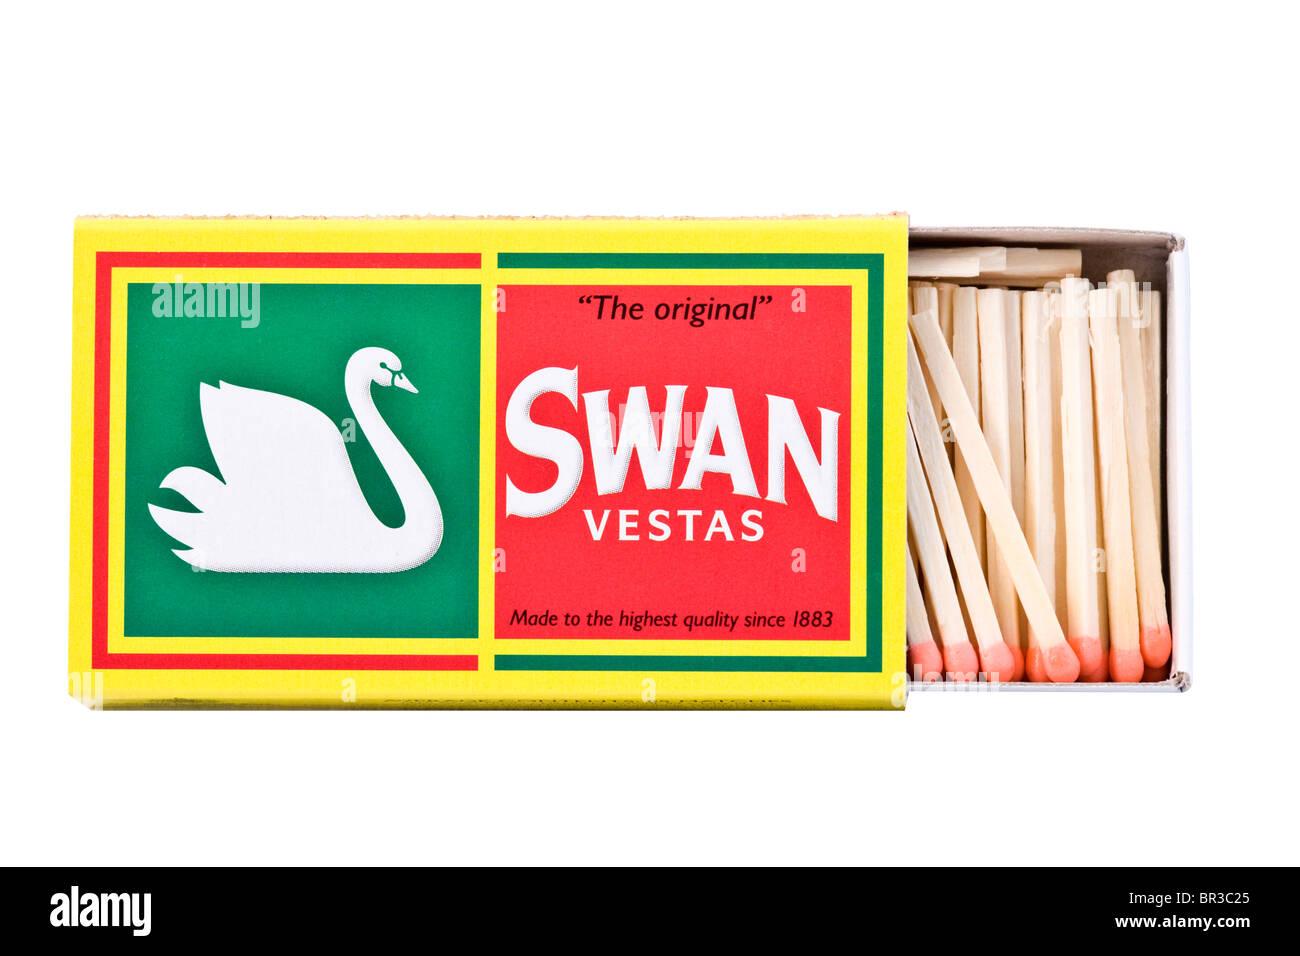 Swan Vesta Matches - Stock Image